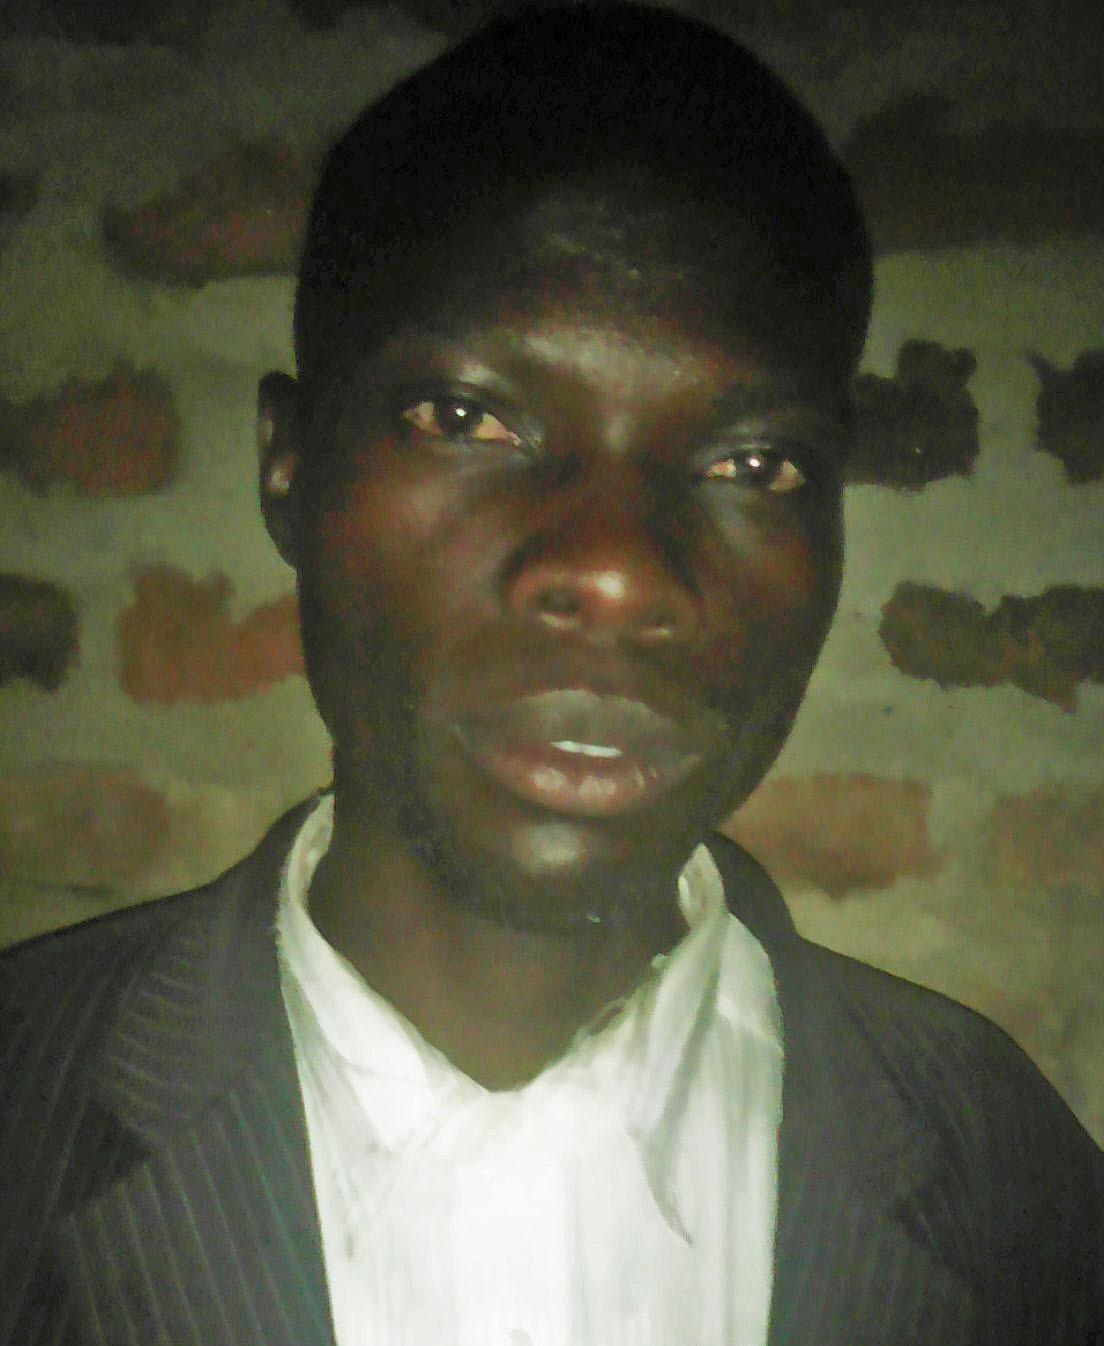 Islamic extremists attacked former sheikh Mulangira Ibrahim. (Morning Star News)